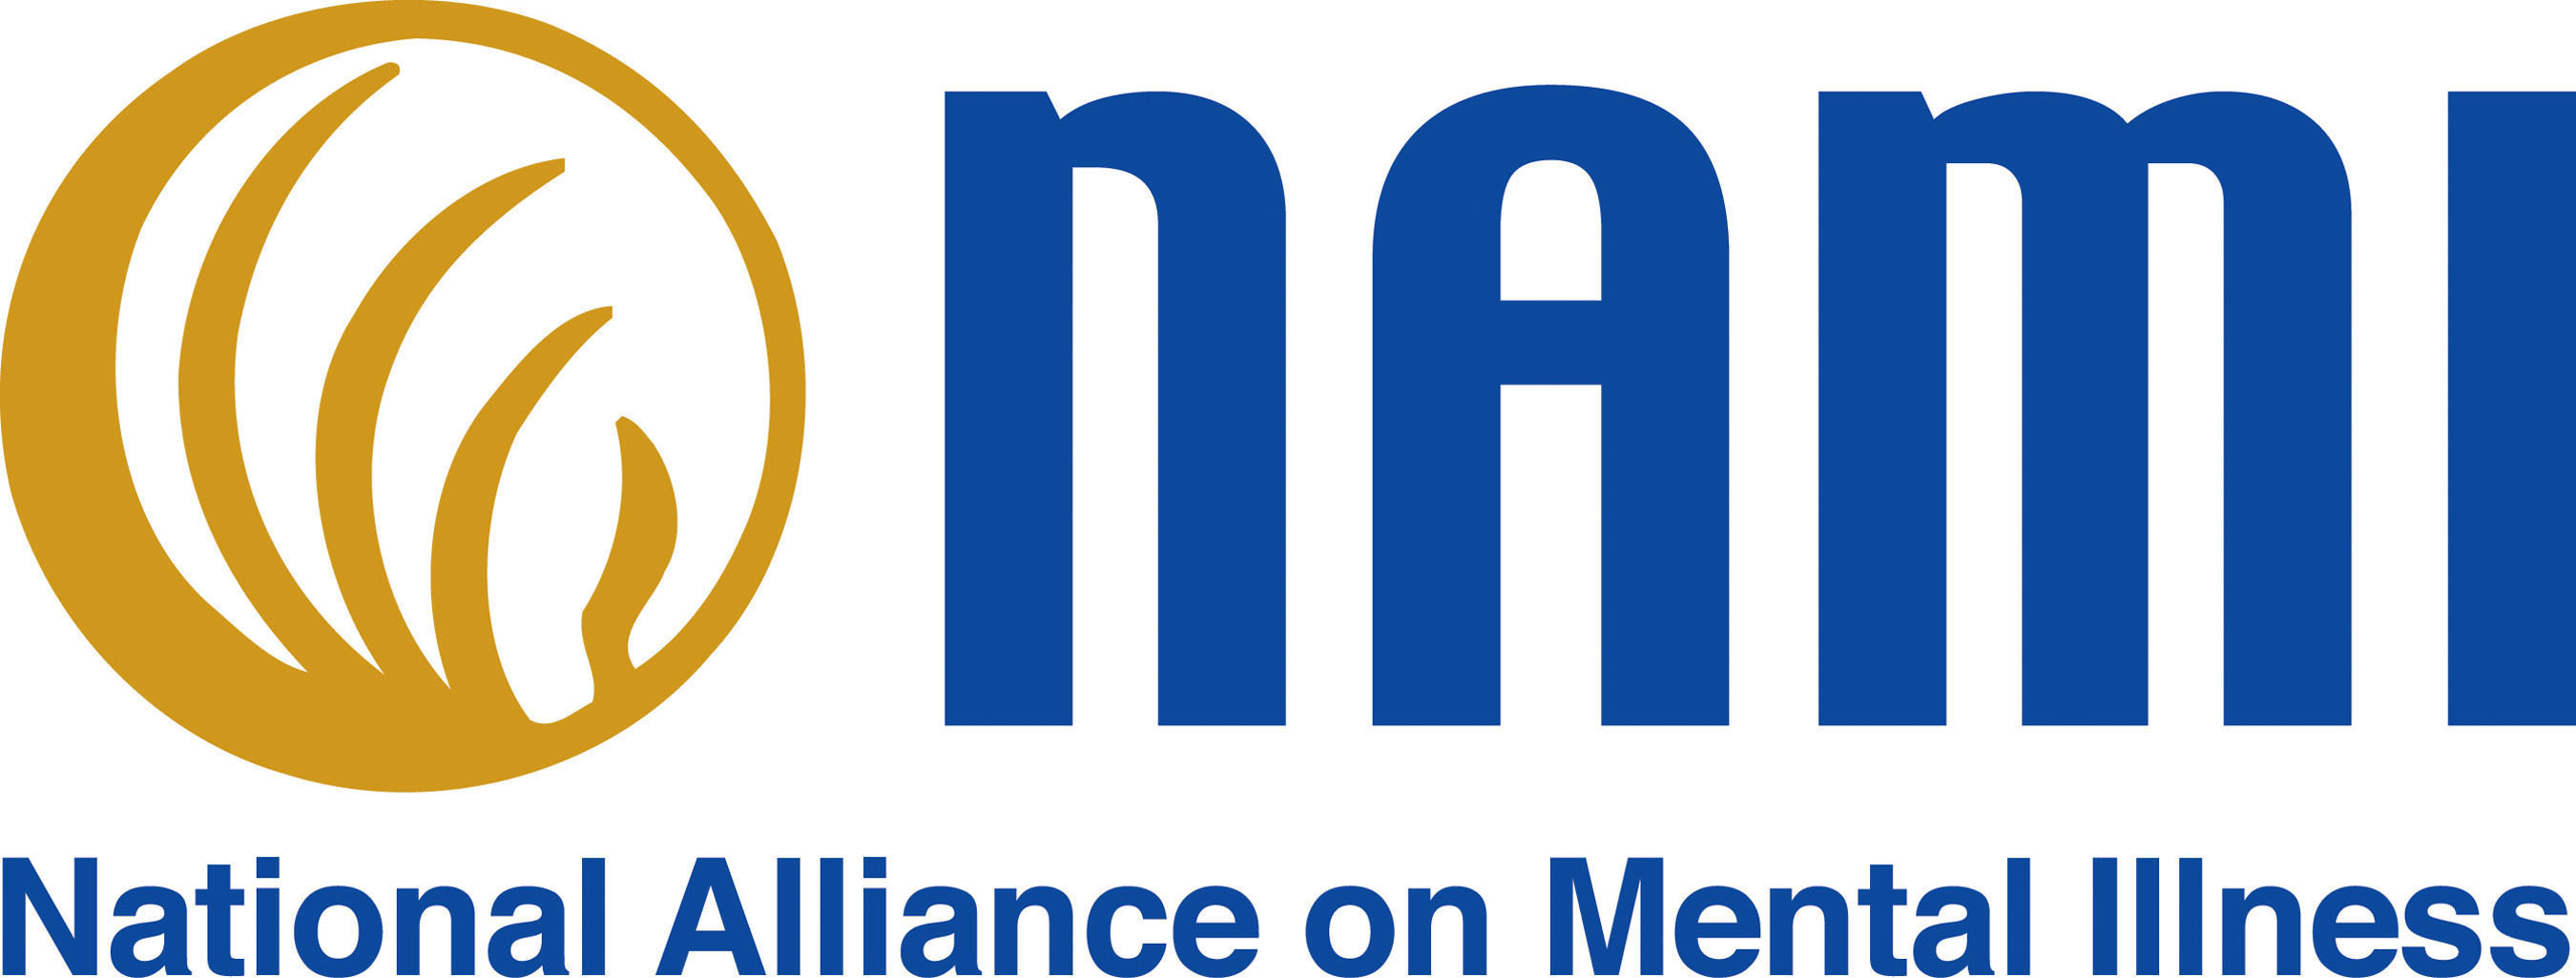 National Alliance on Mental Illness.